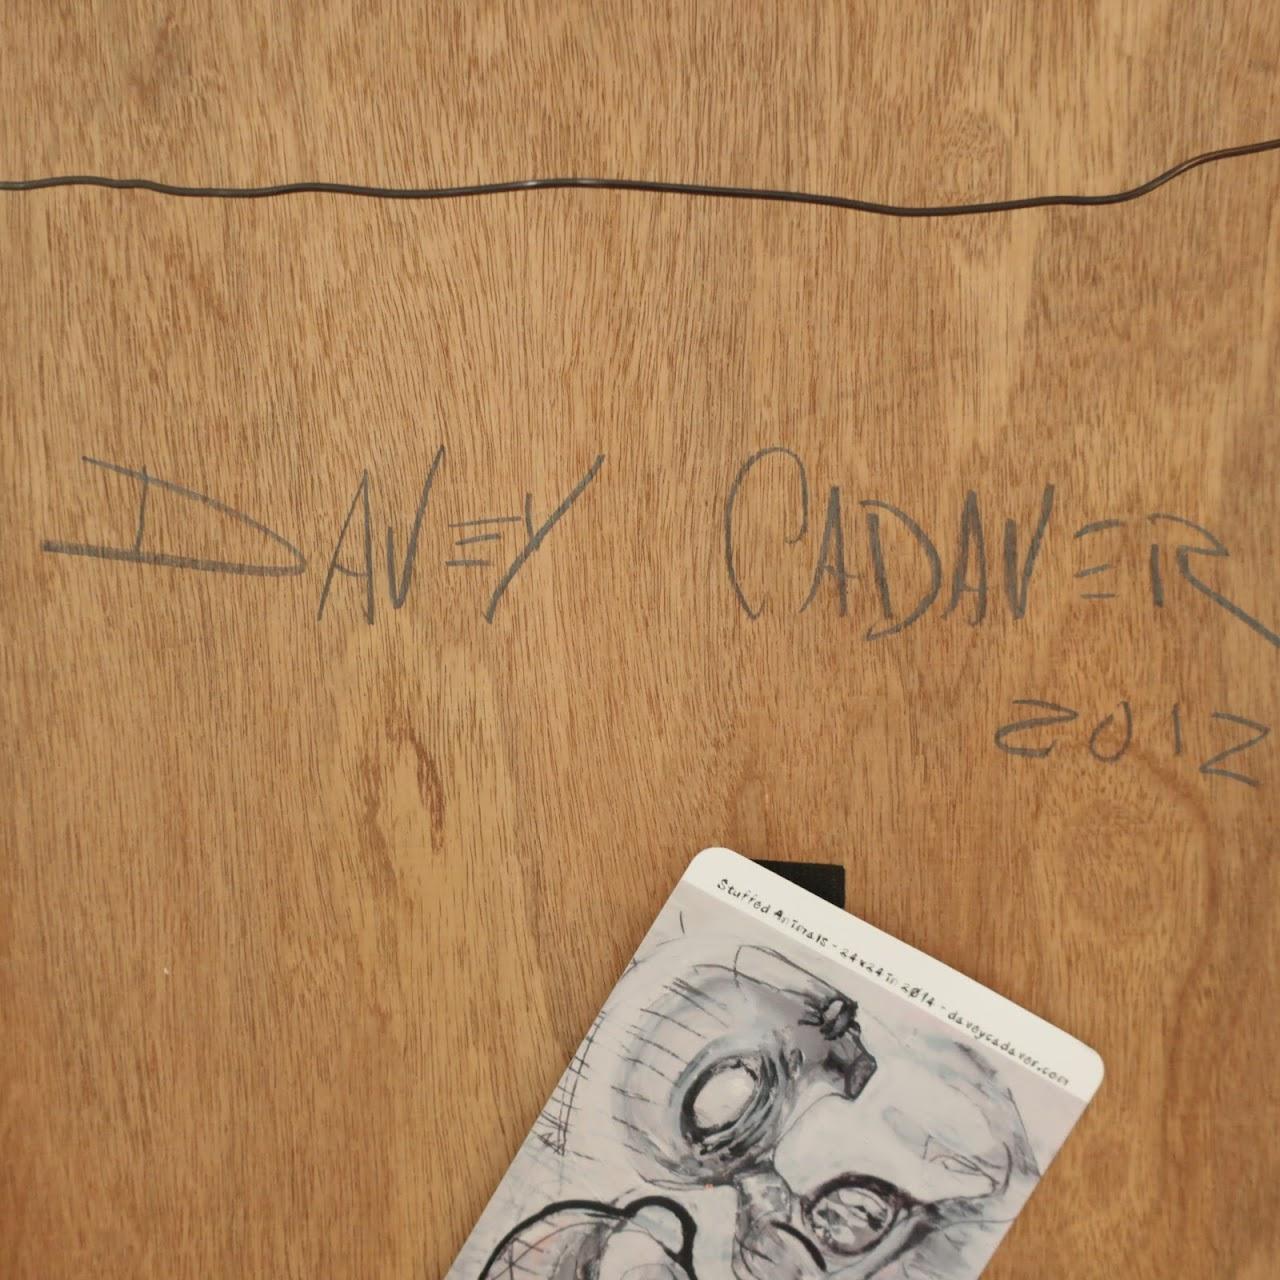 Davey Cadaver Signed Painting